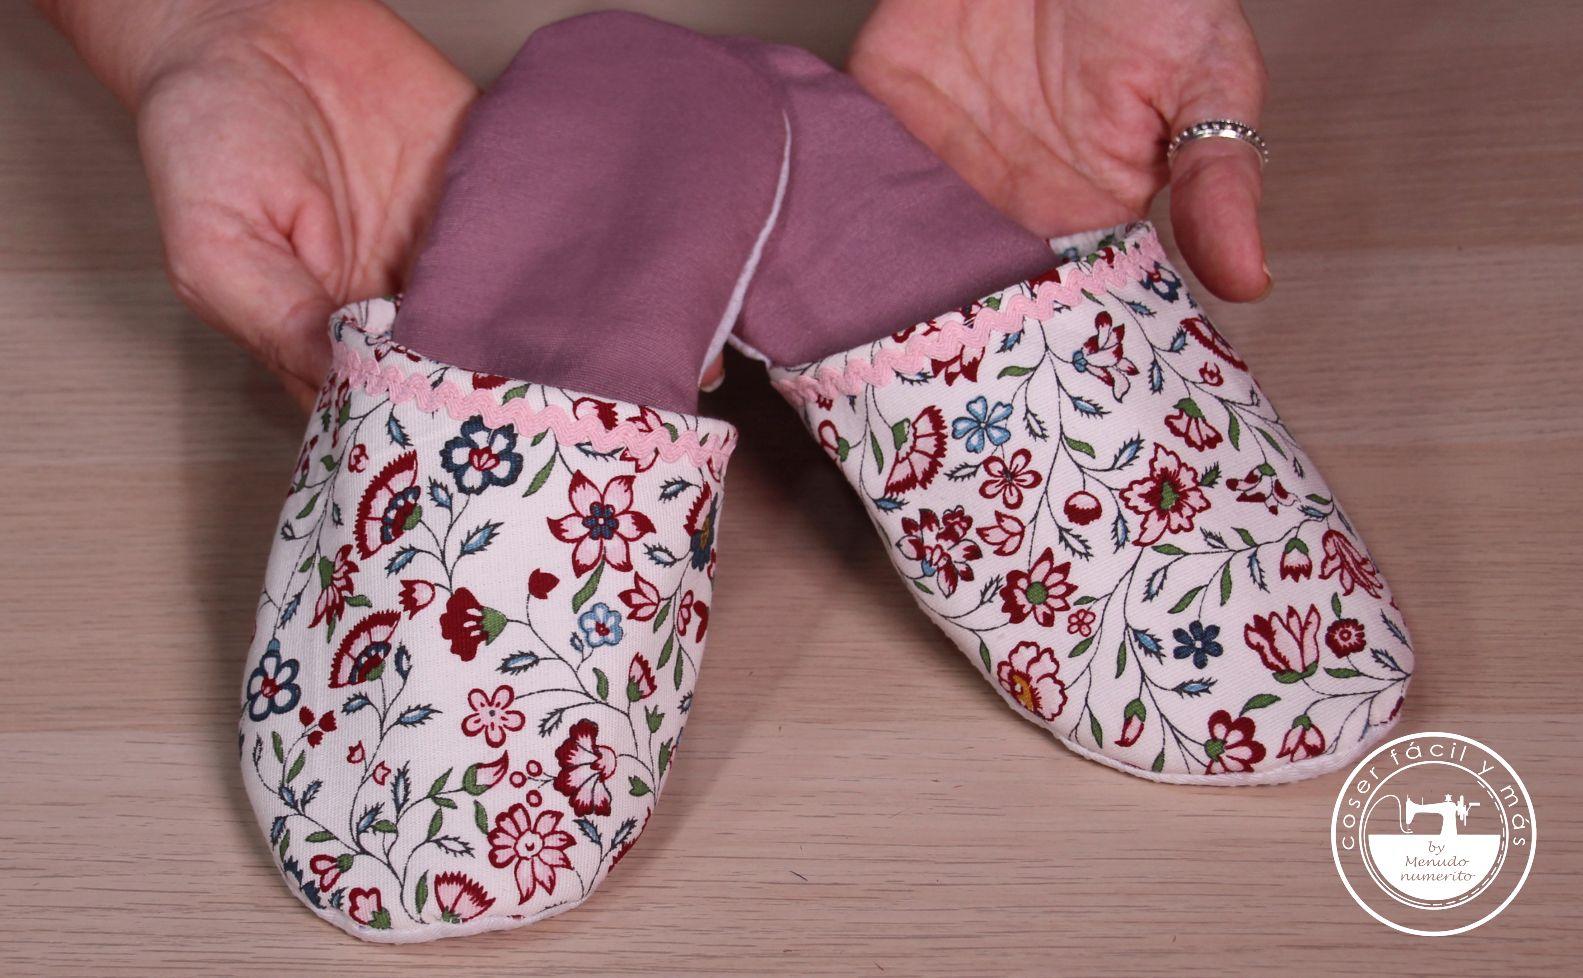 zapatillas de casa tela coser facil blogs de costura